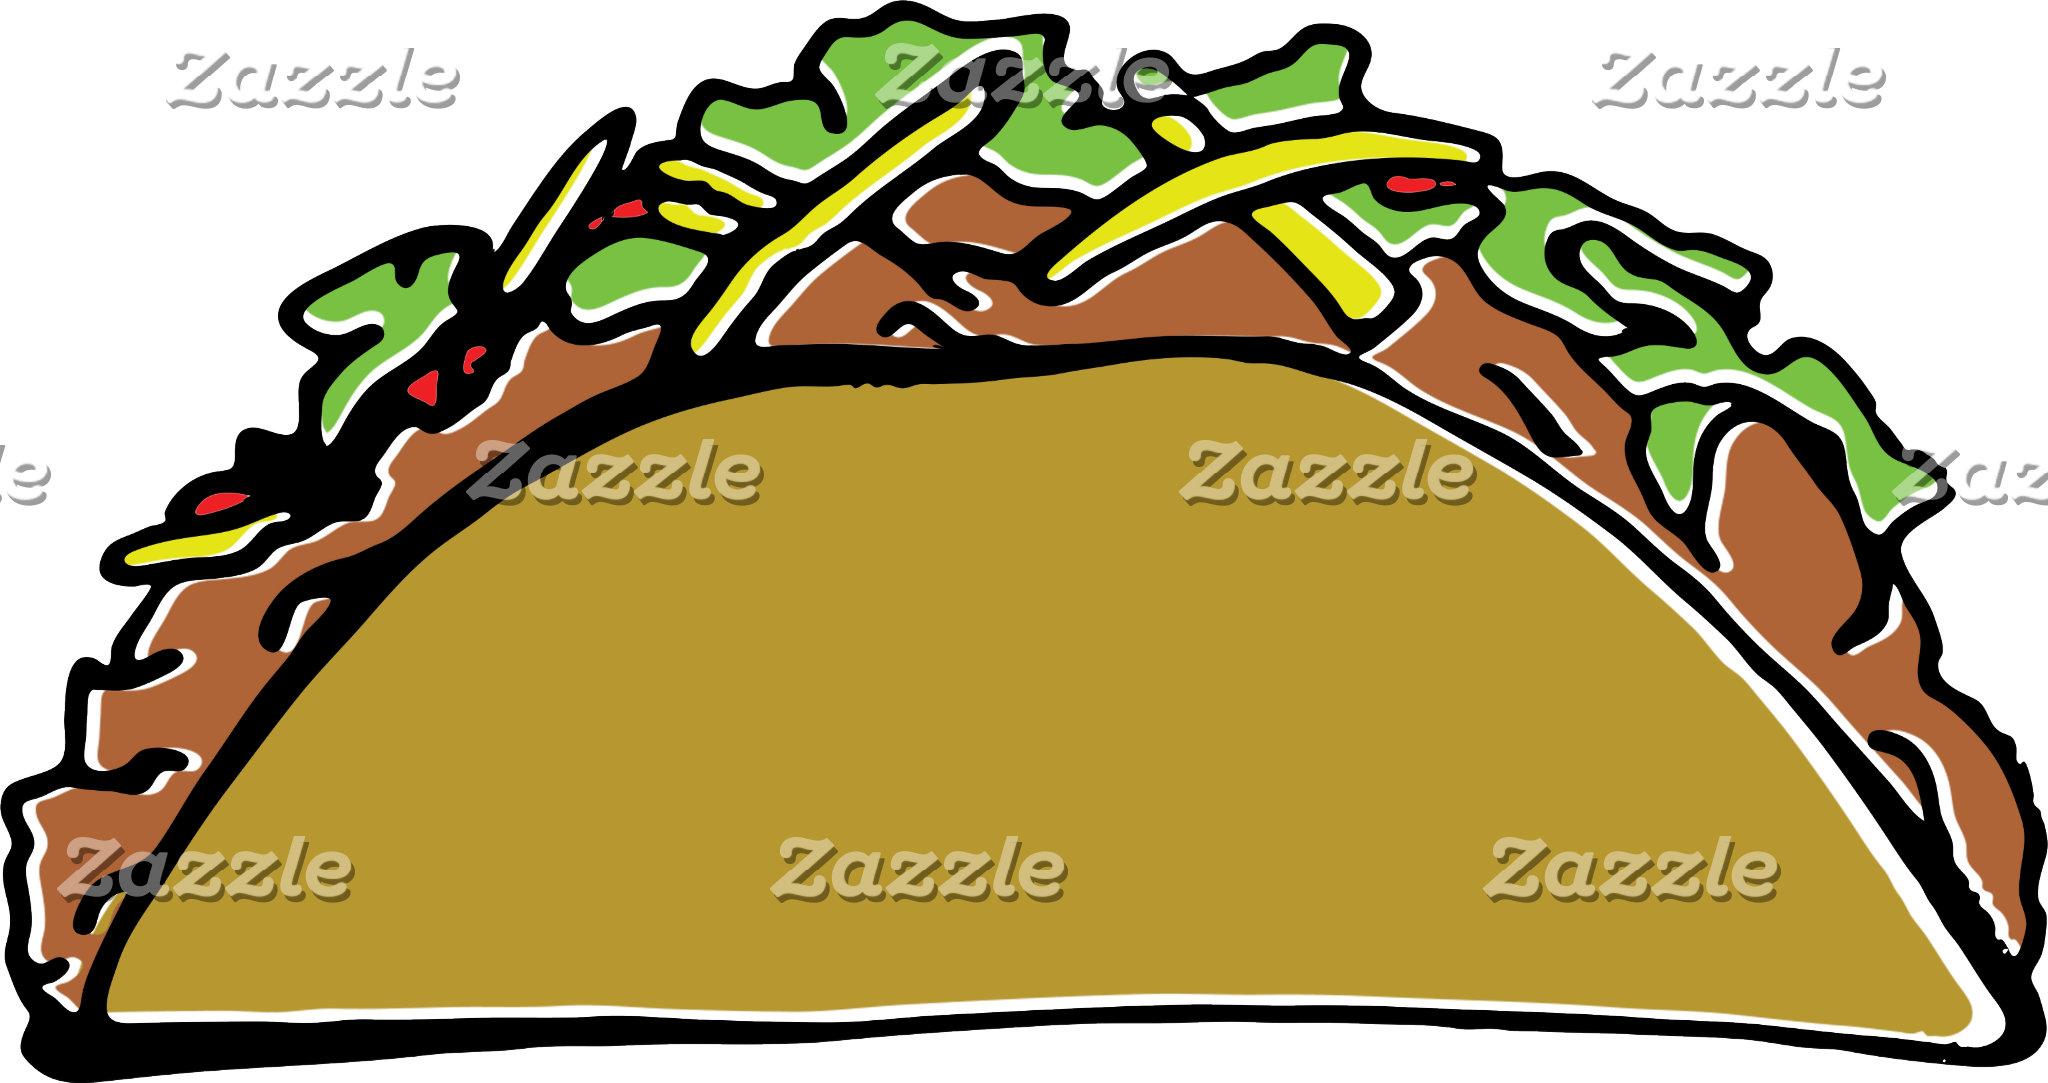 The S-x&Tacos Sketch